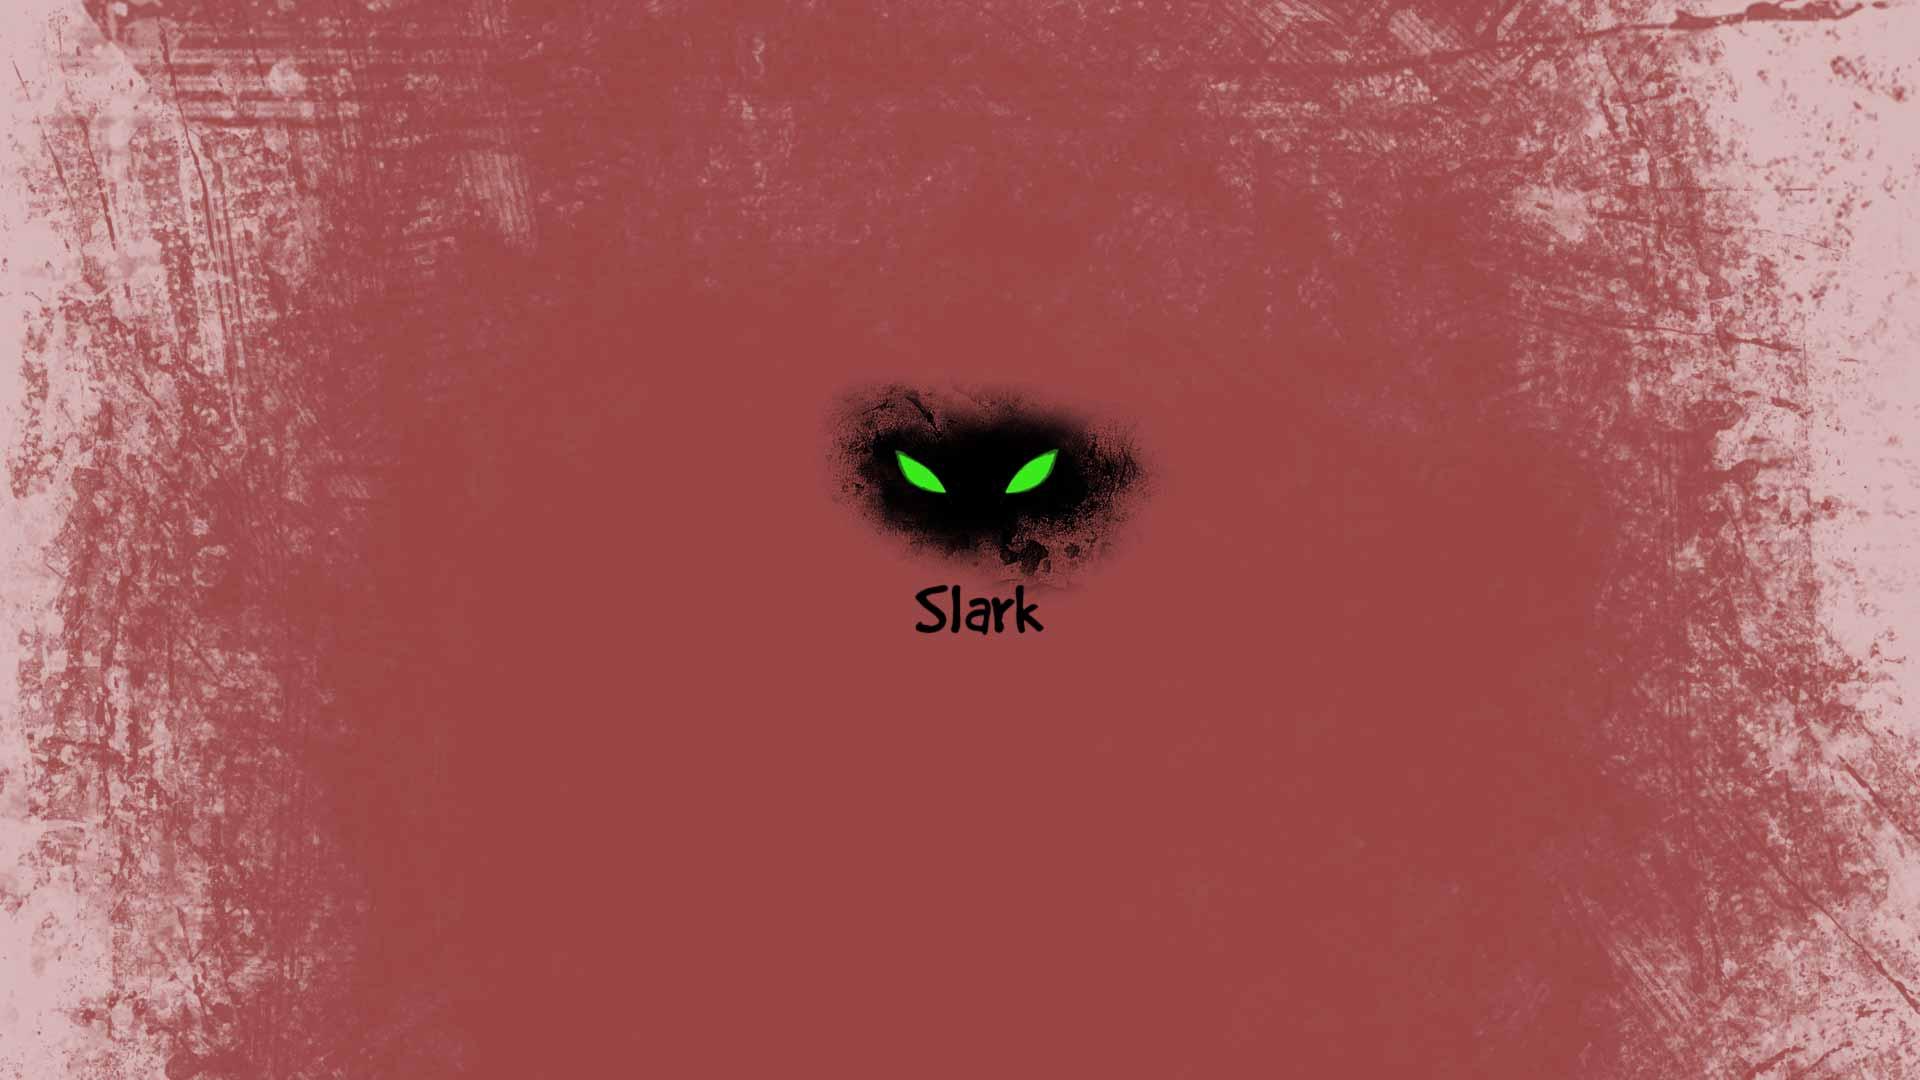 Dota2 : Slark Free